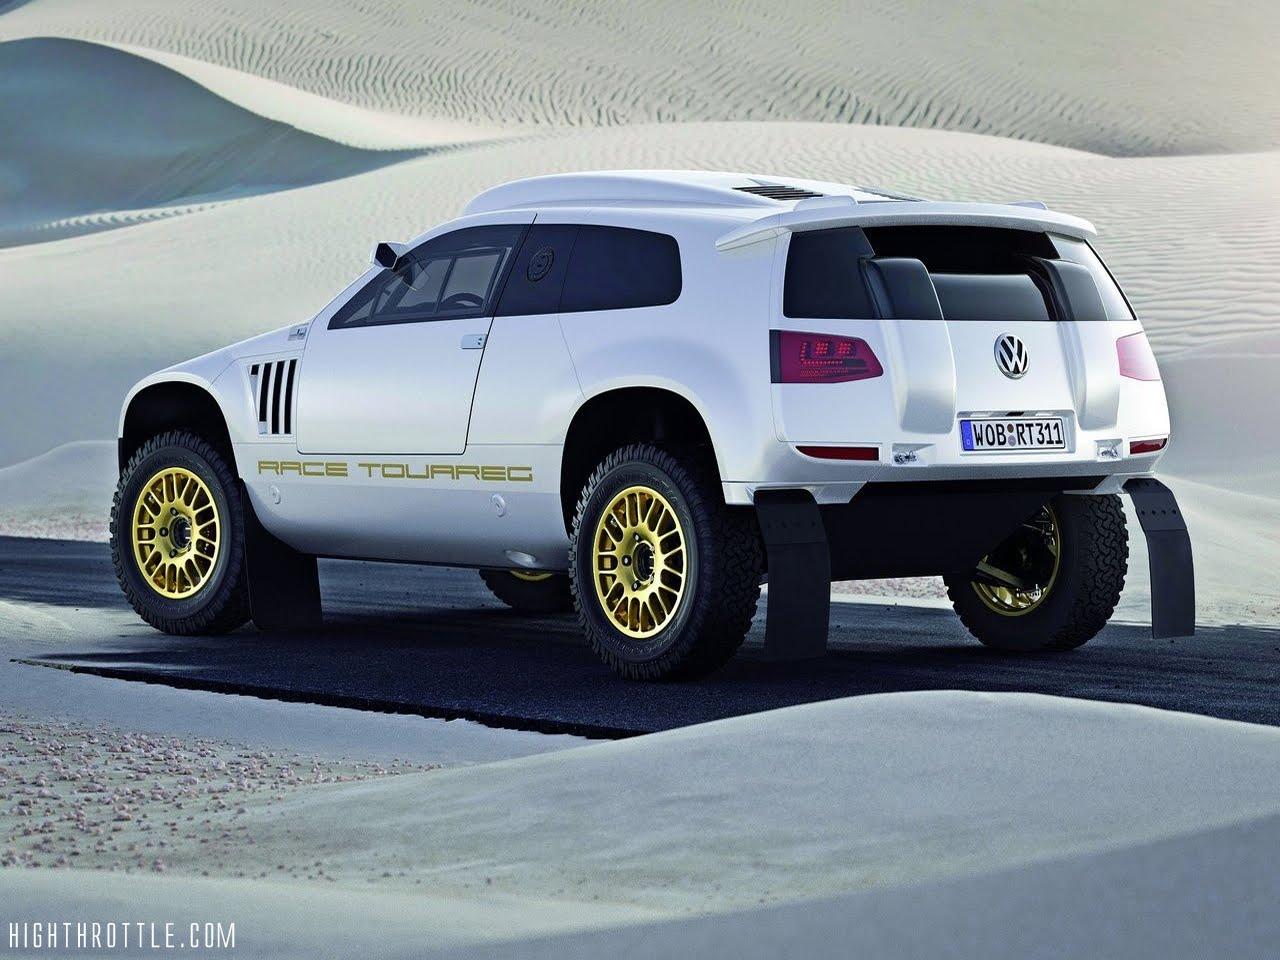 http://4.bp.blogspot.com/_2WGWUztppL8/TUFaO-1lGZI/AAAAAAAAEgc/Xgs-uYx0Kdw/s1600/Volkswagen-Race_Touareg_3_Qatar_Concept_2011_1280x960_wallpaper_04.jpg